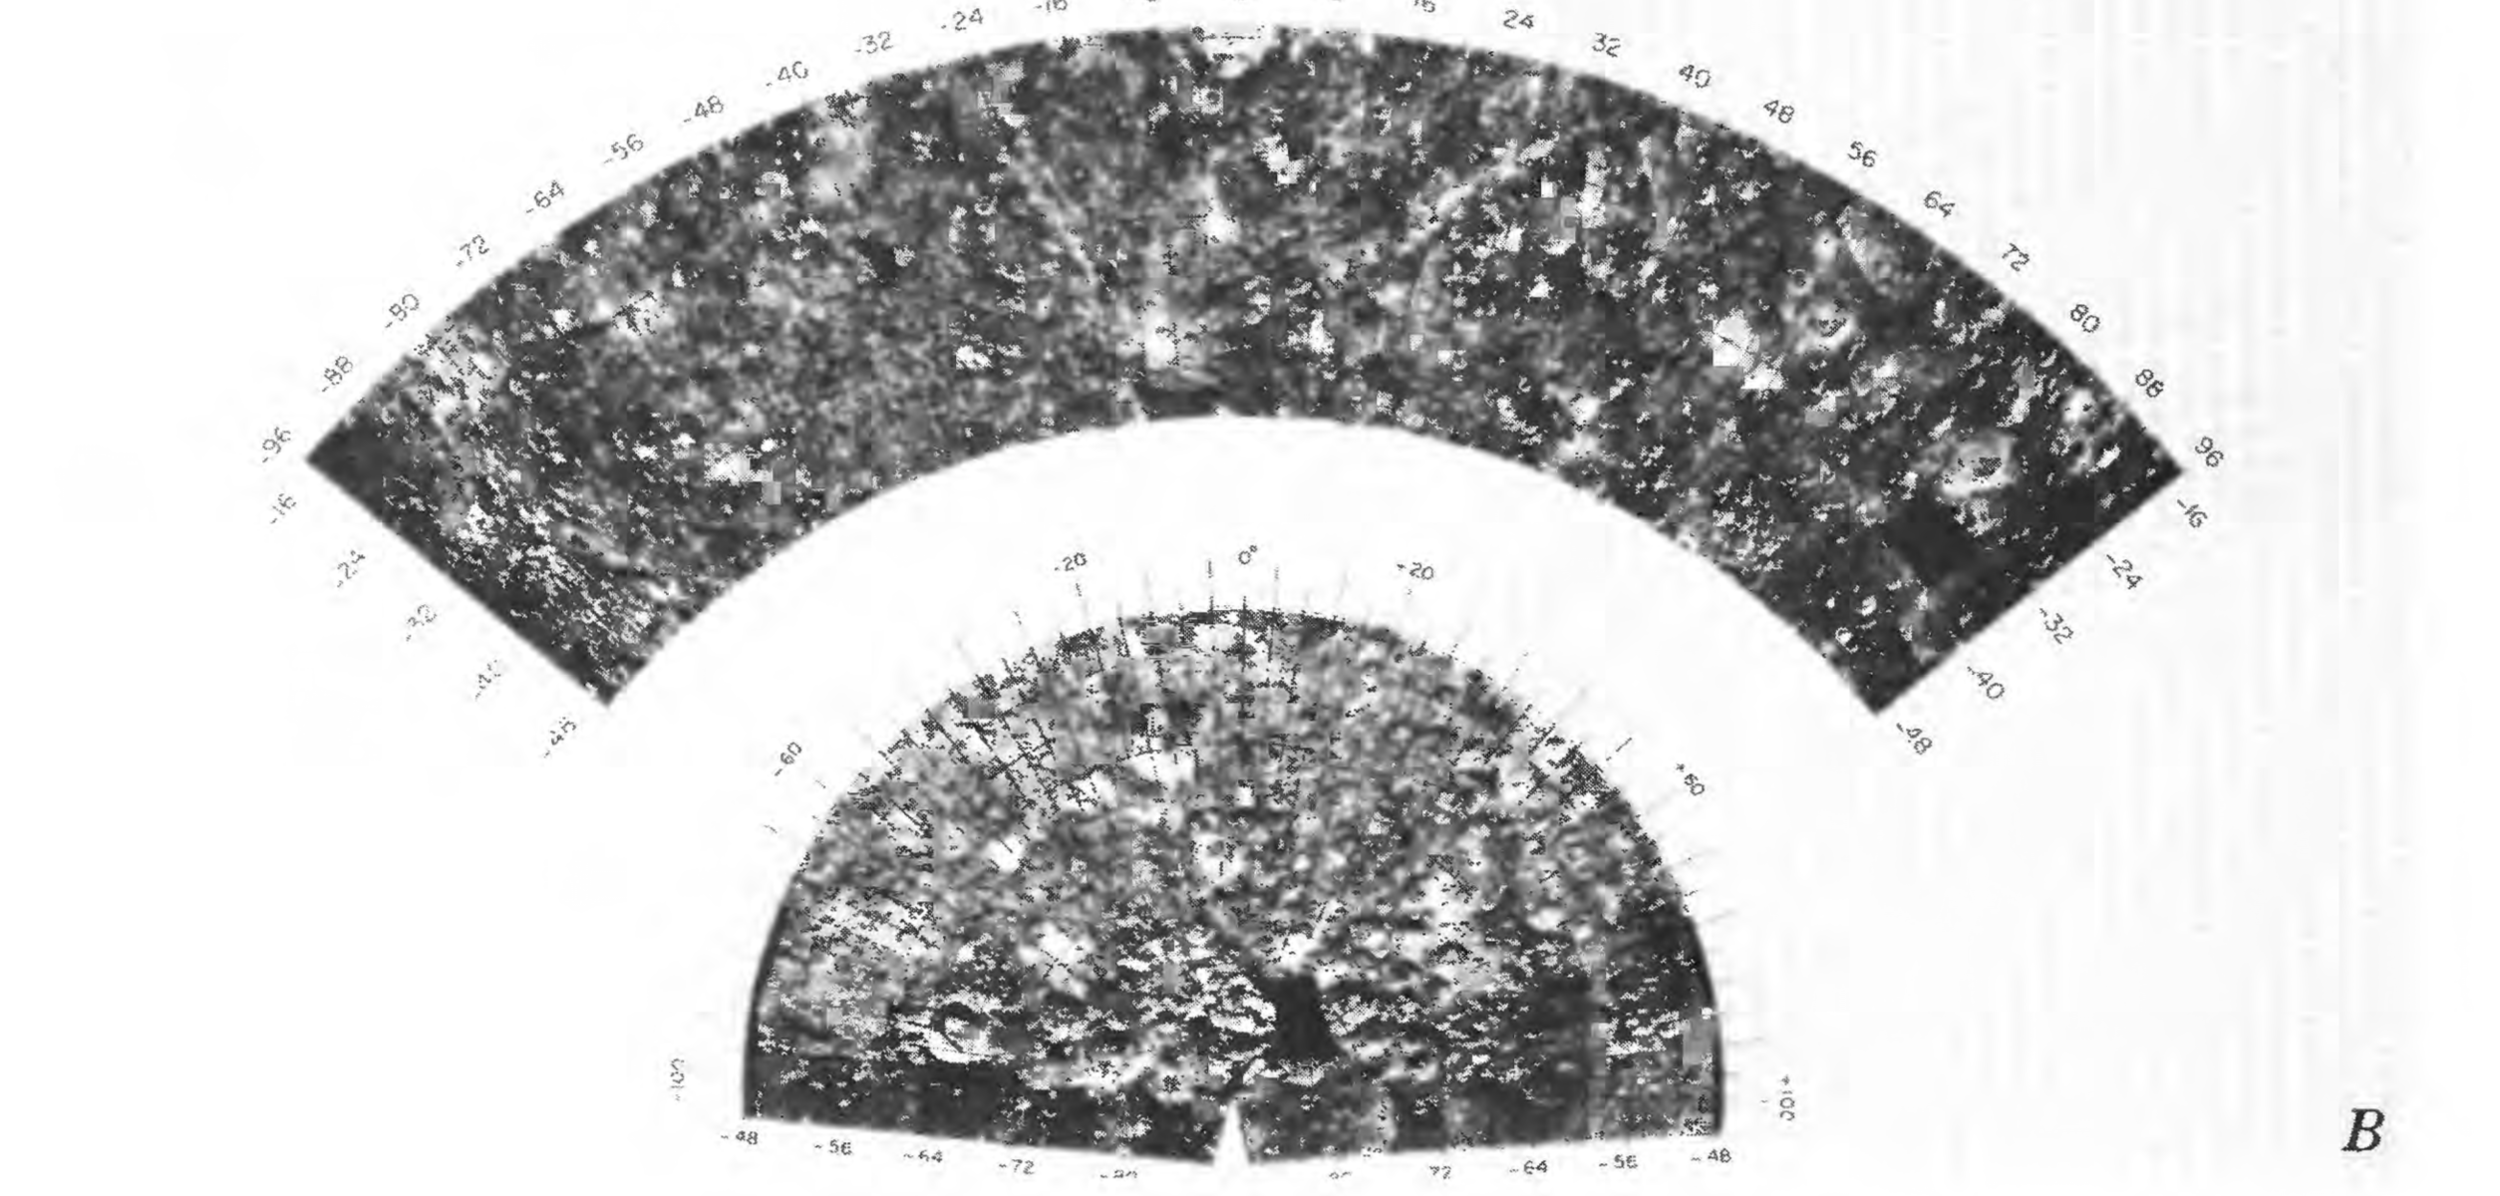 Moon Radar Image 2.png